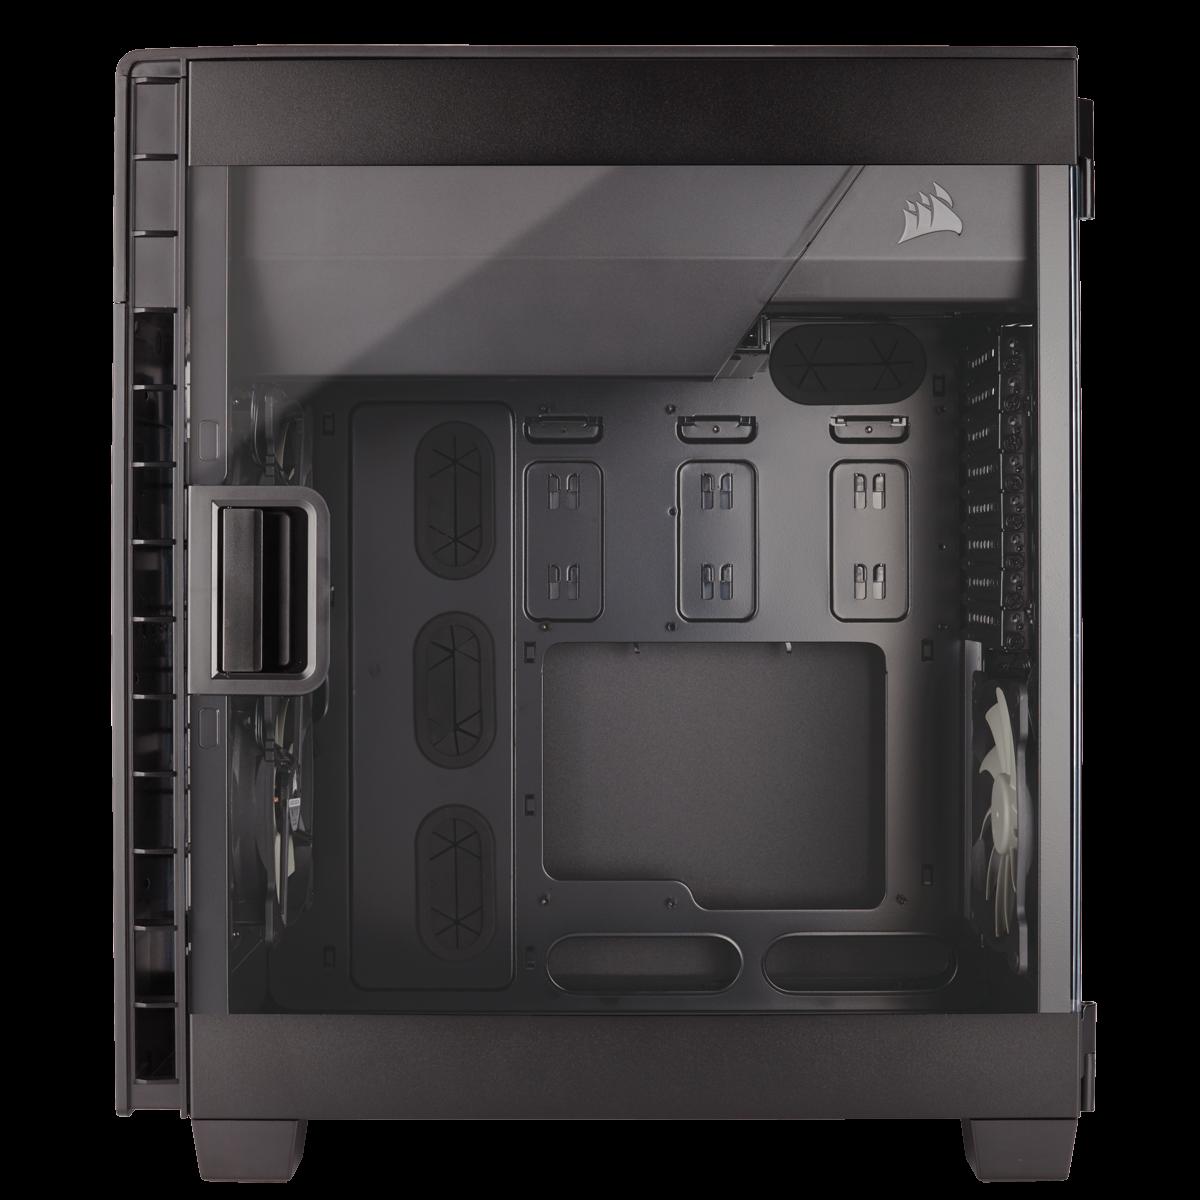 Gabinete Gamer Corsair Carbide Clear 600C Inverse, Full Tower, Com 3 Fans, Lateral em Acrílico, Sem Fonte, CC-9011079-WW